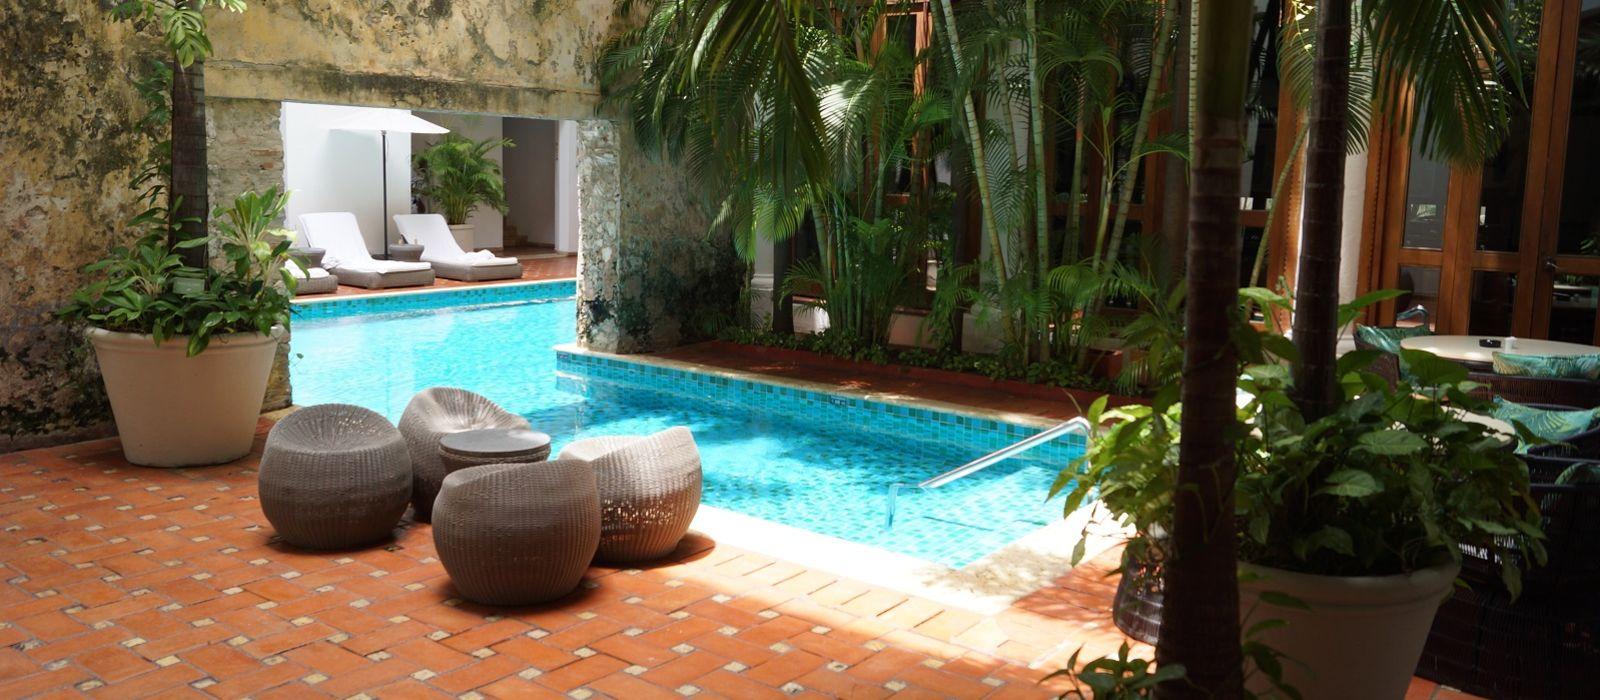 Hotel Casa San Agustin Colombia